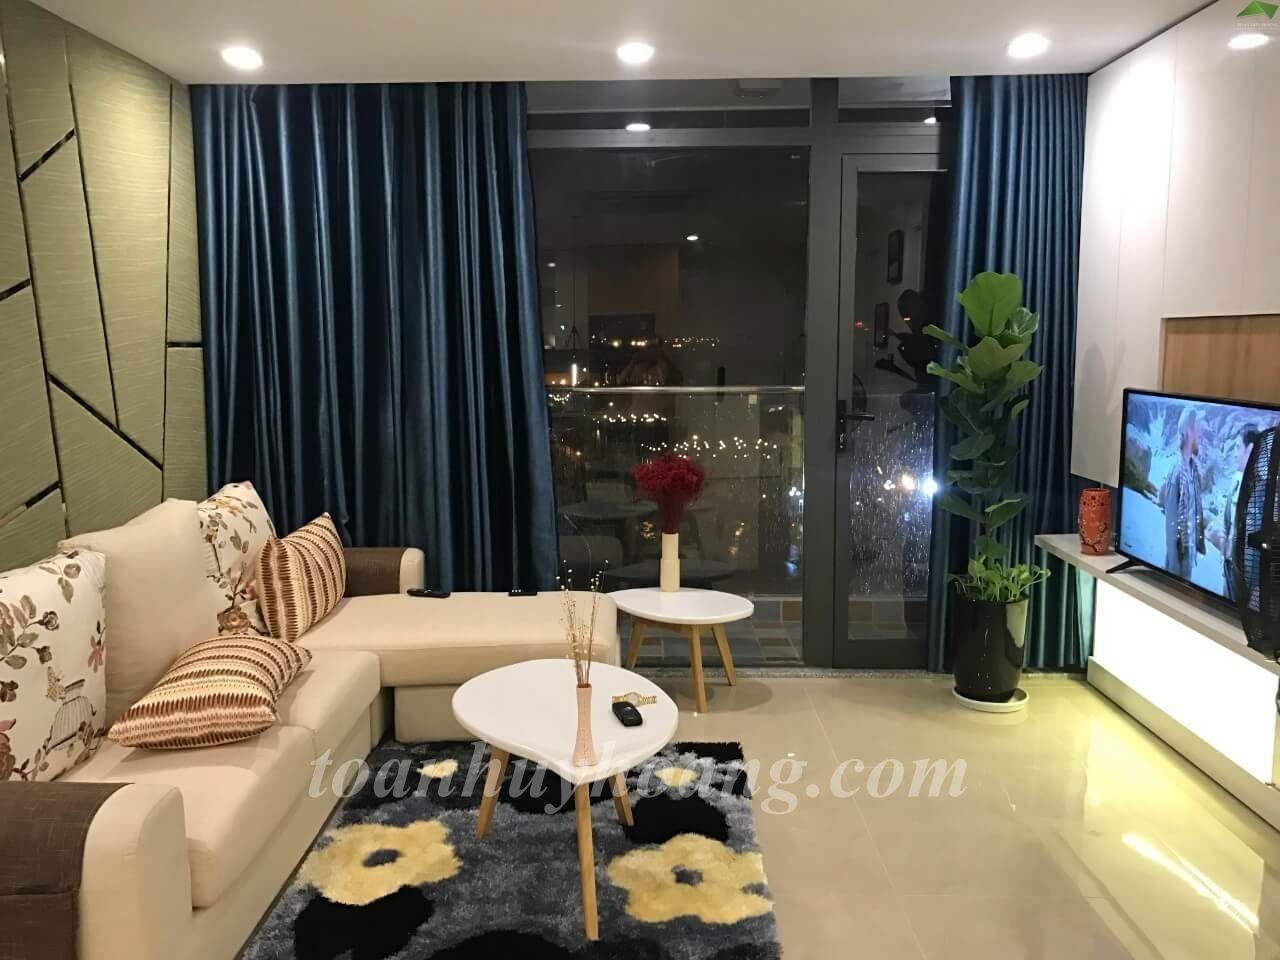 Apartment Rental in Quang Nguyen